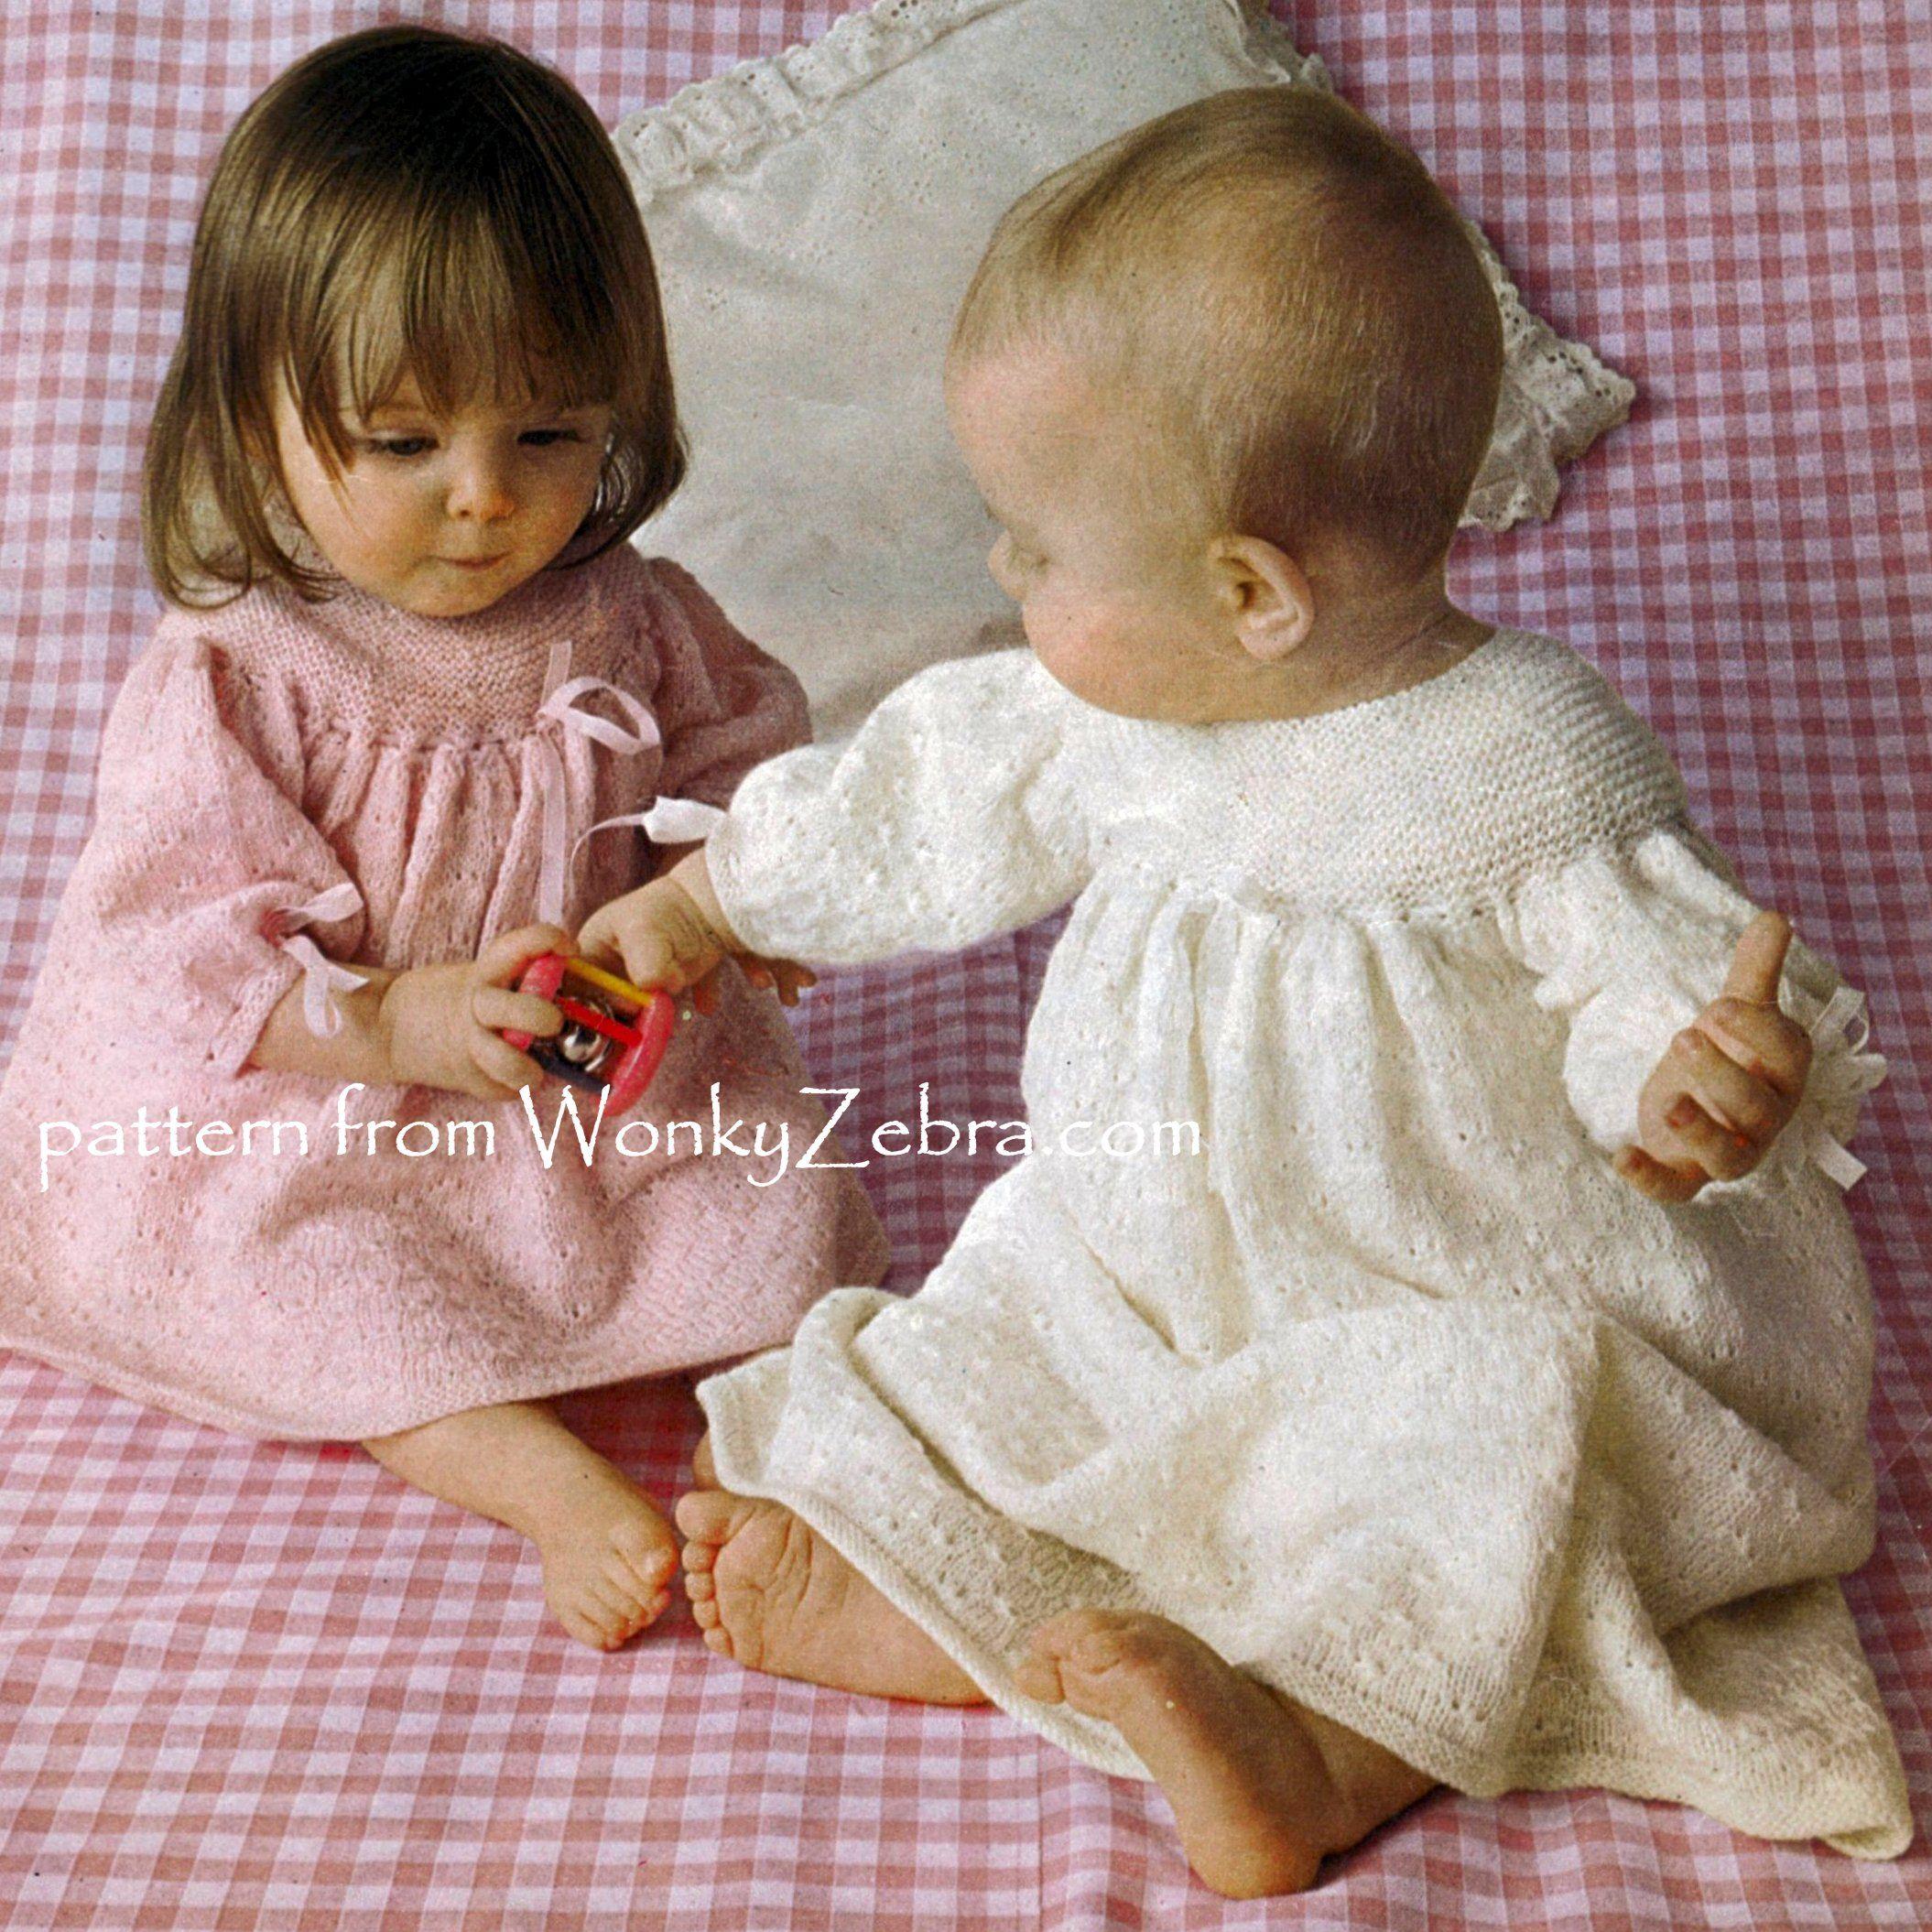 Wonkyzebrababy B086 Baby Christening Dress Baby Clothes